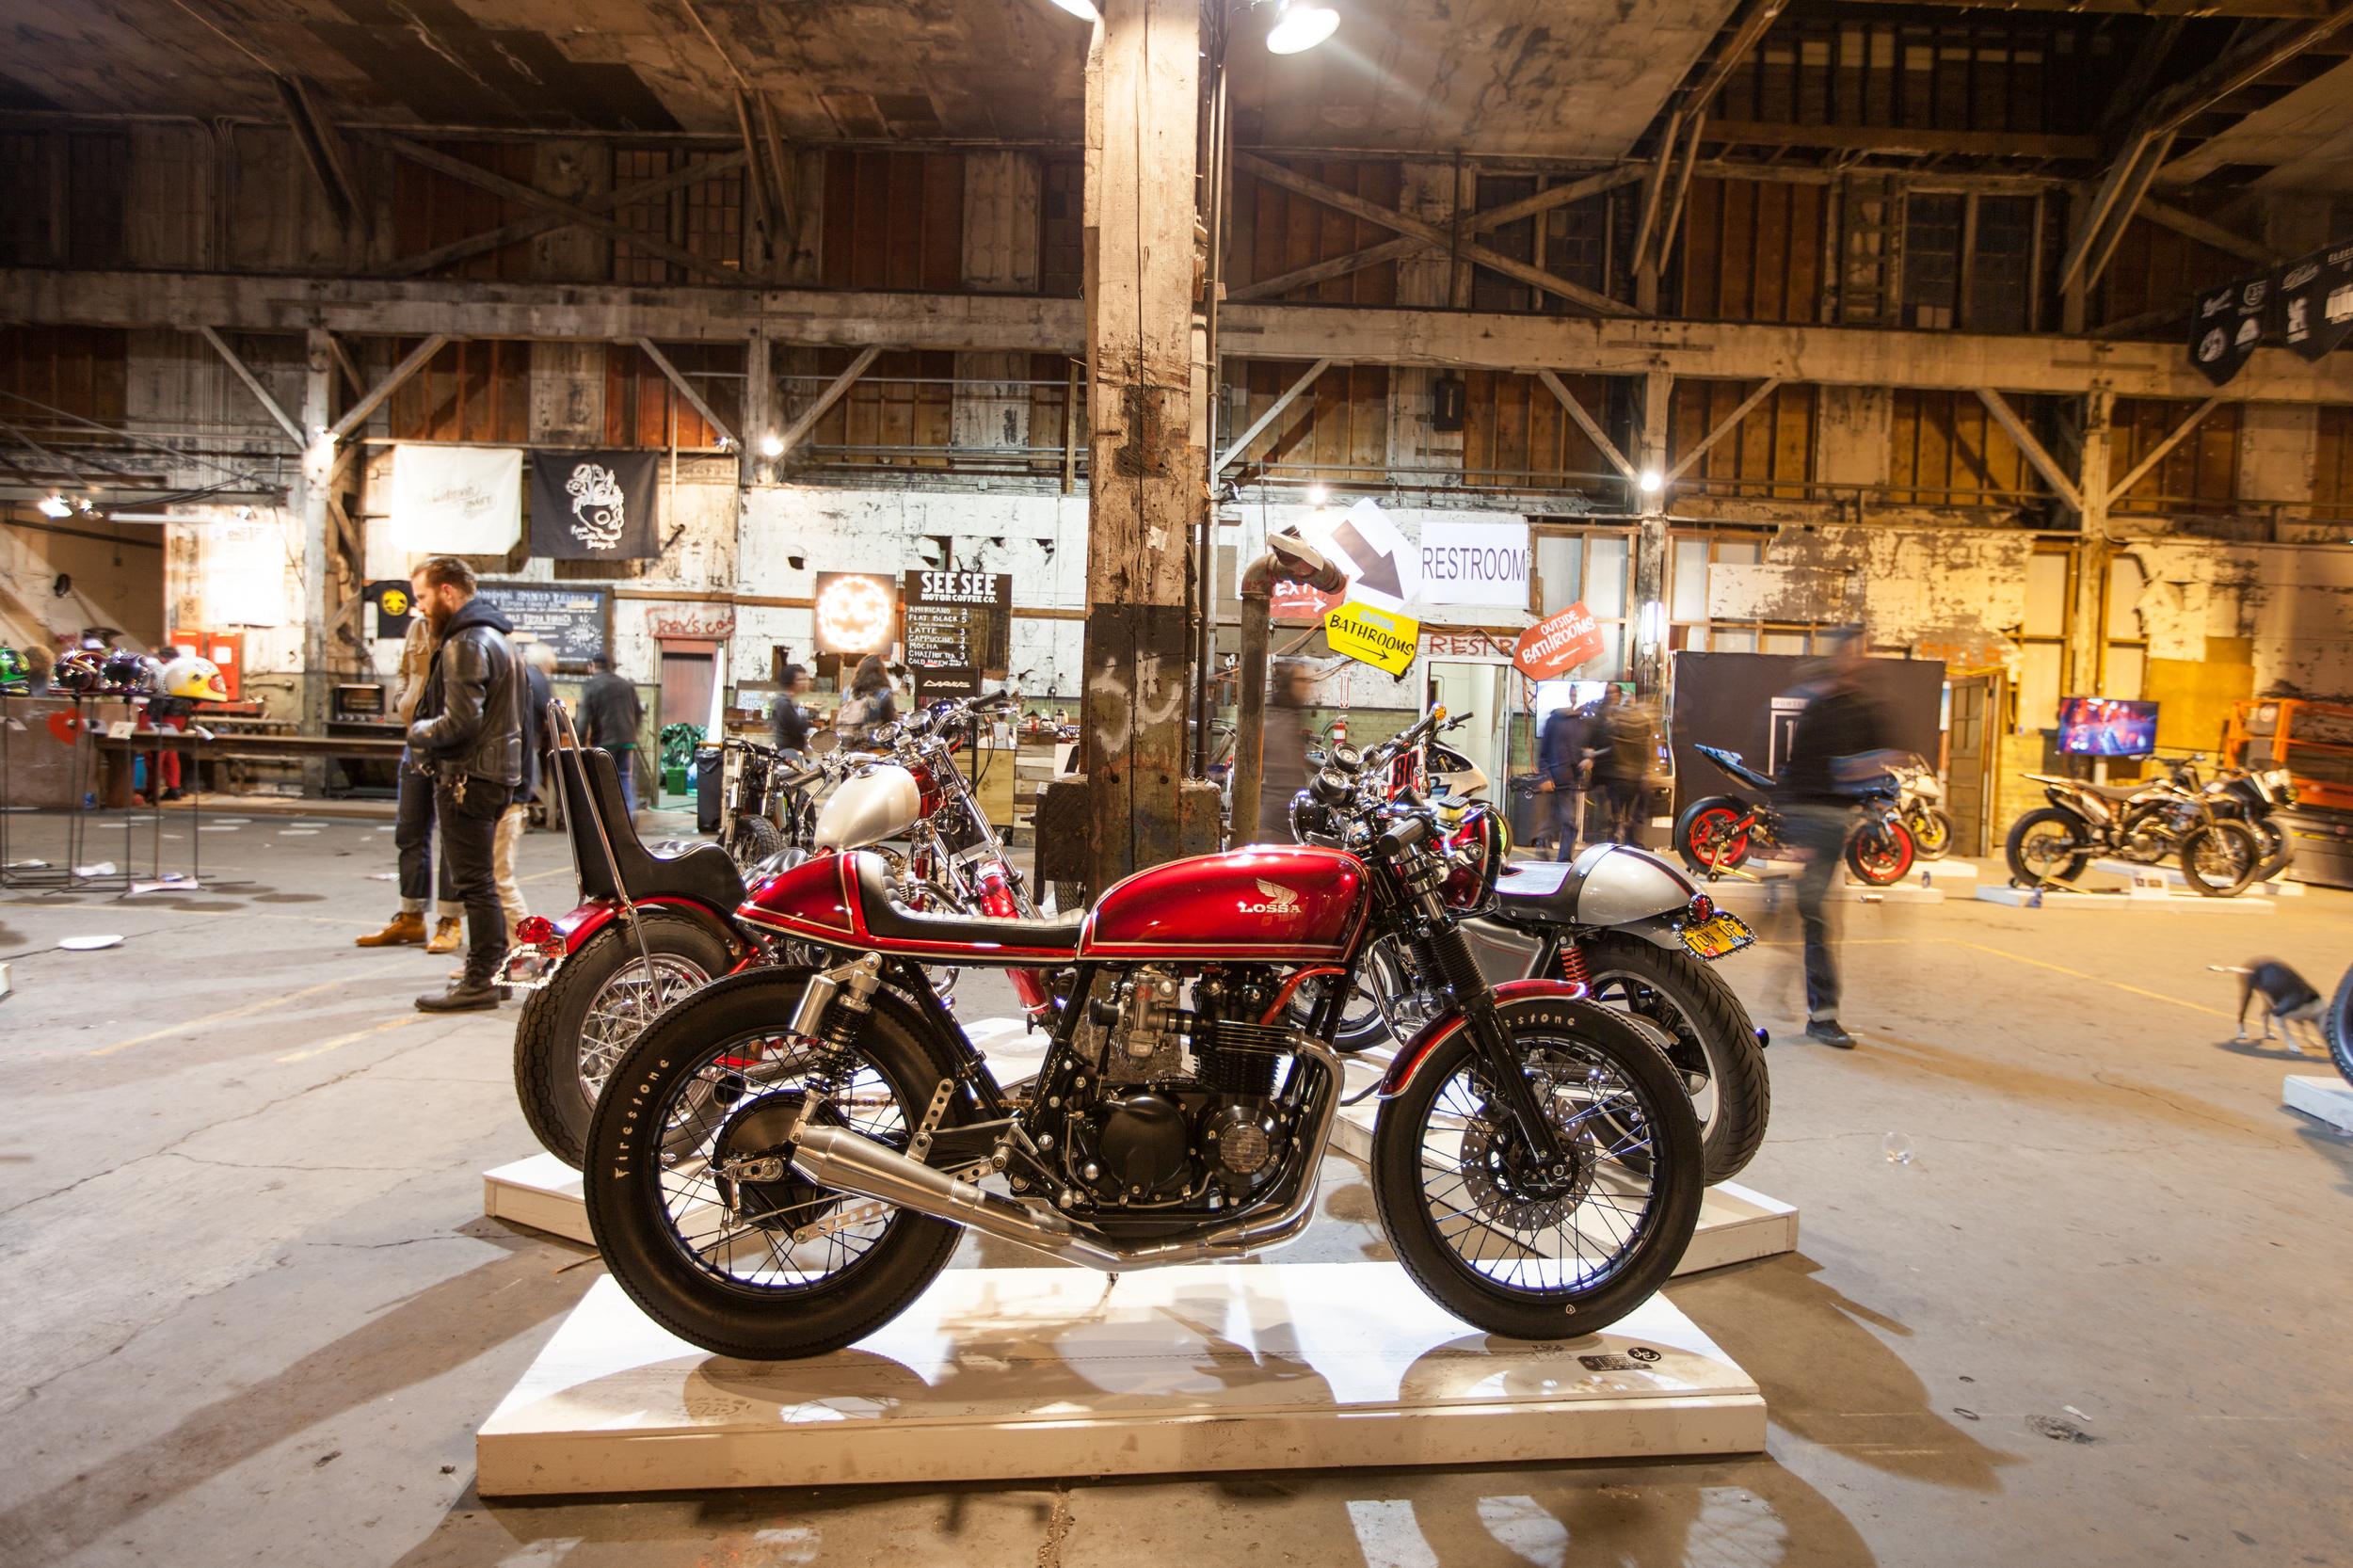 02-14-15 The 1 Moto Show - 2_-22-21.jpg